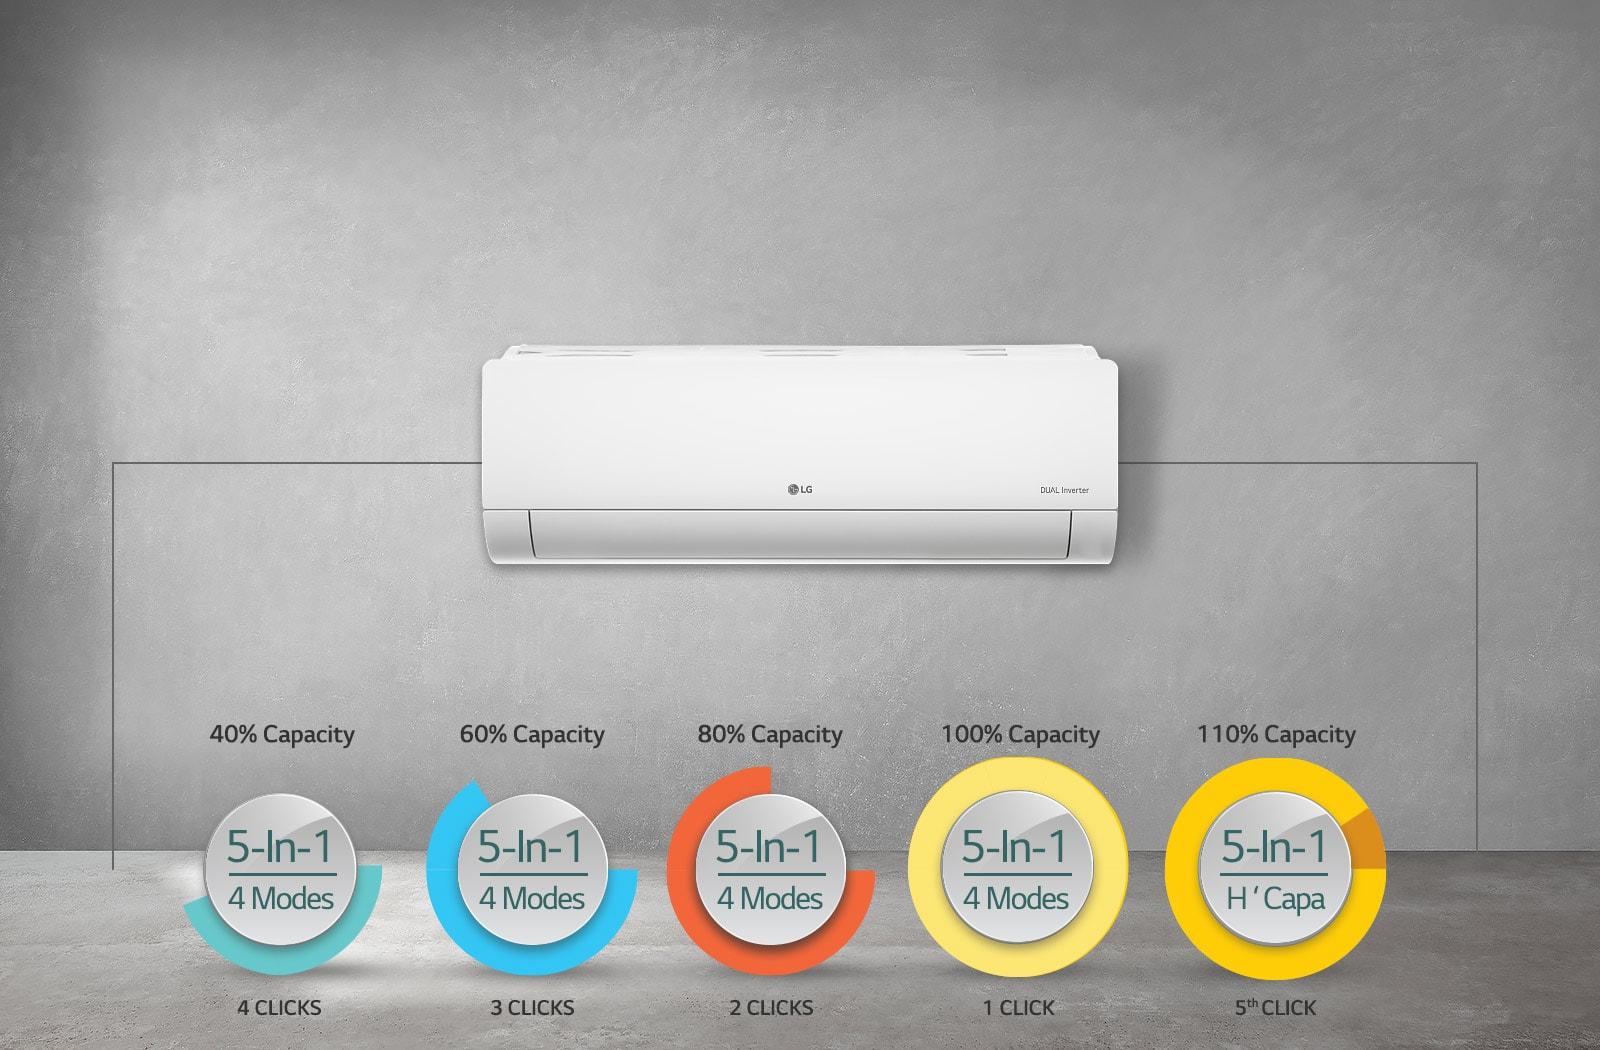 LG MS-Q24HNXA 5-in-1 Cooling